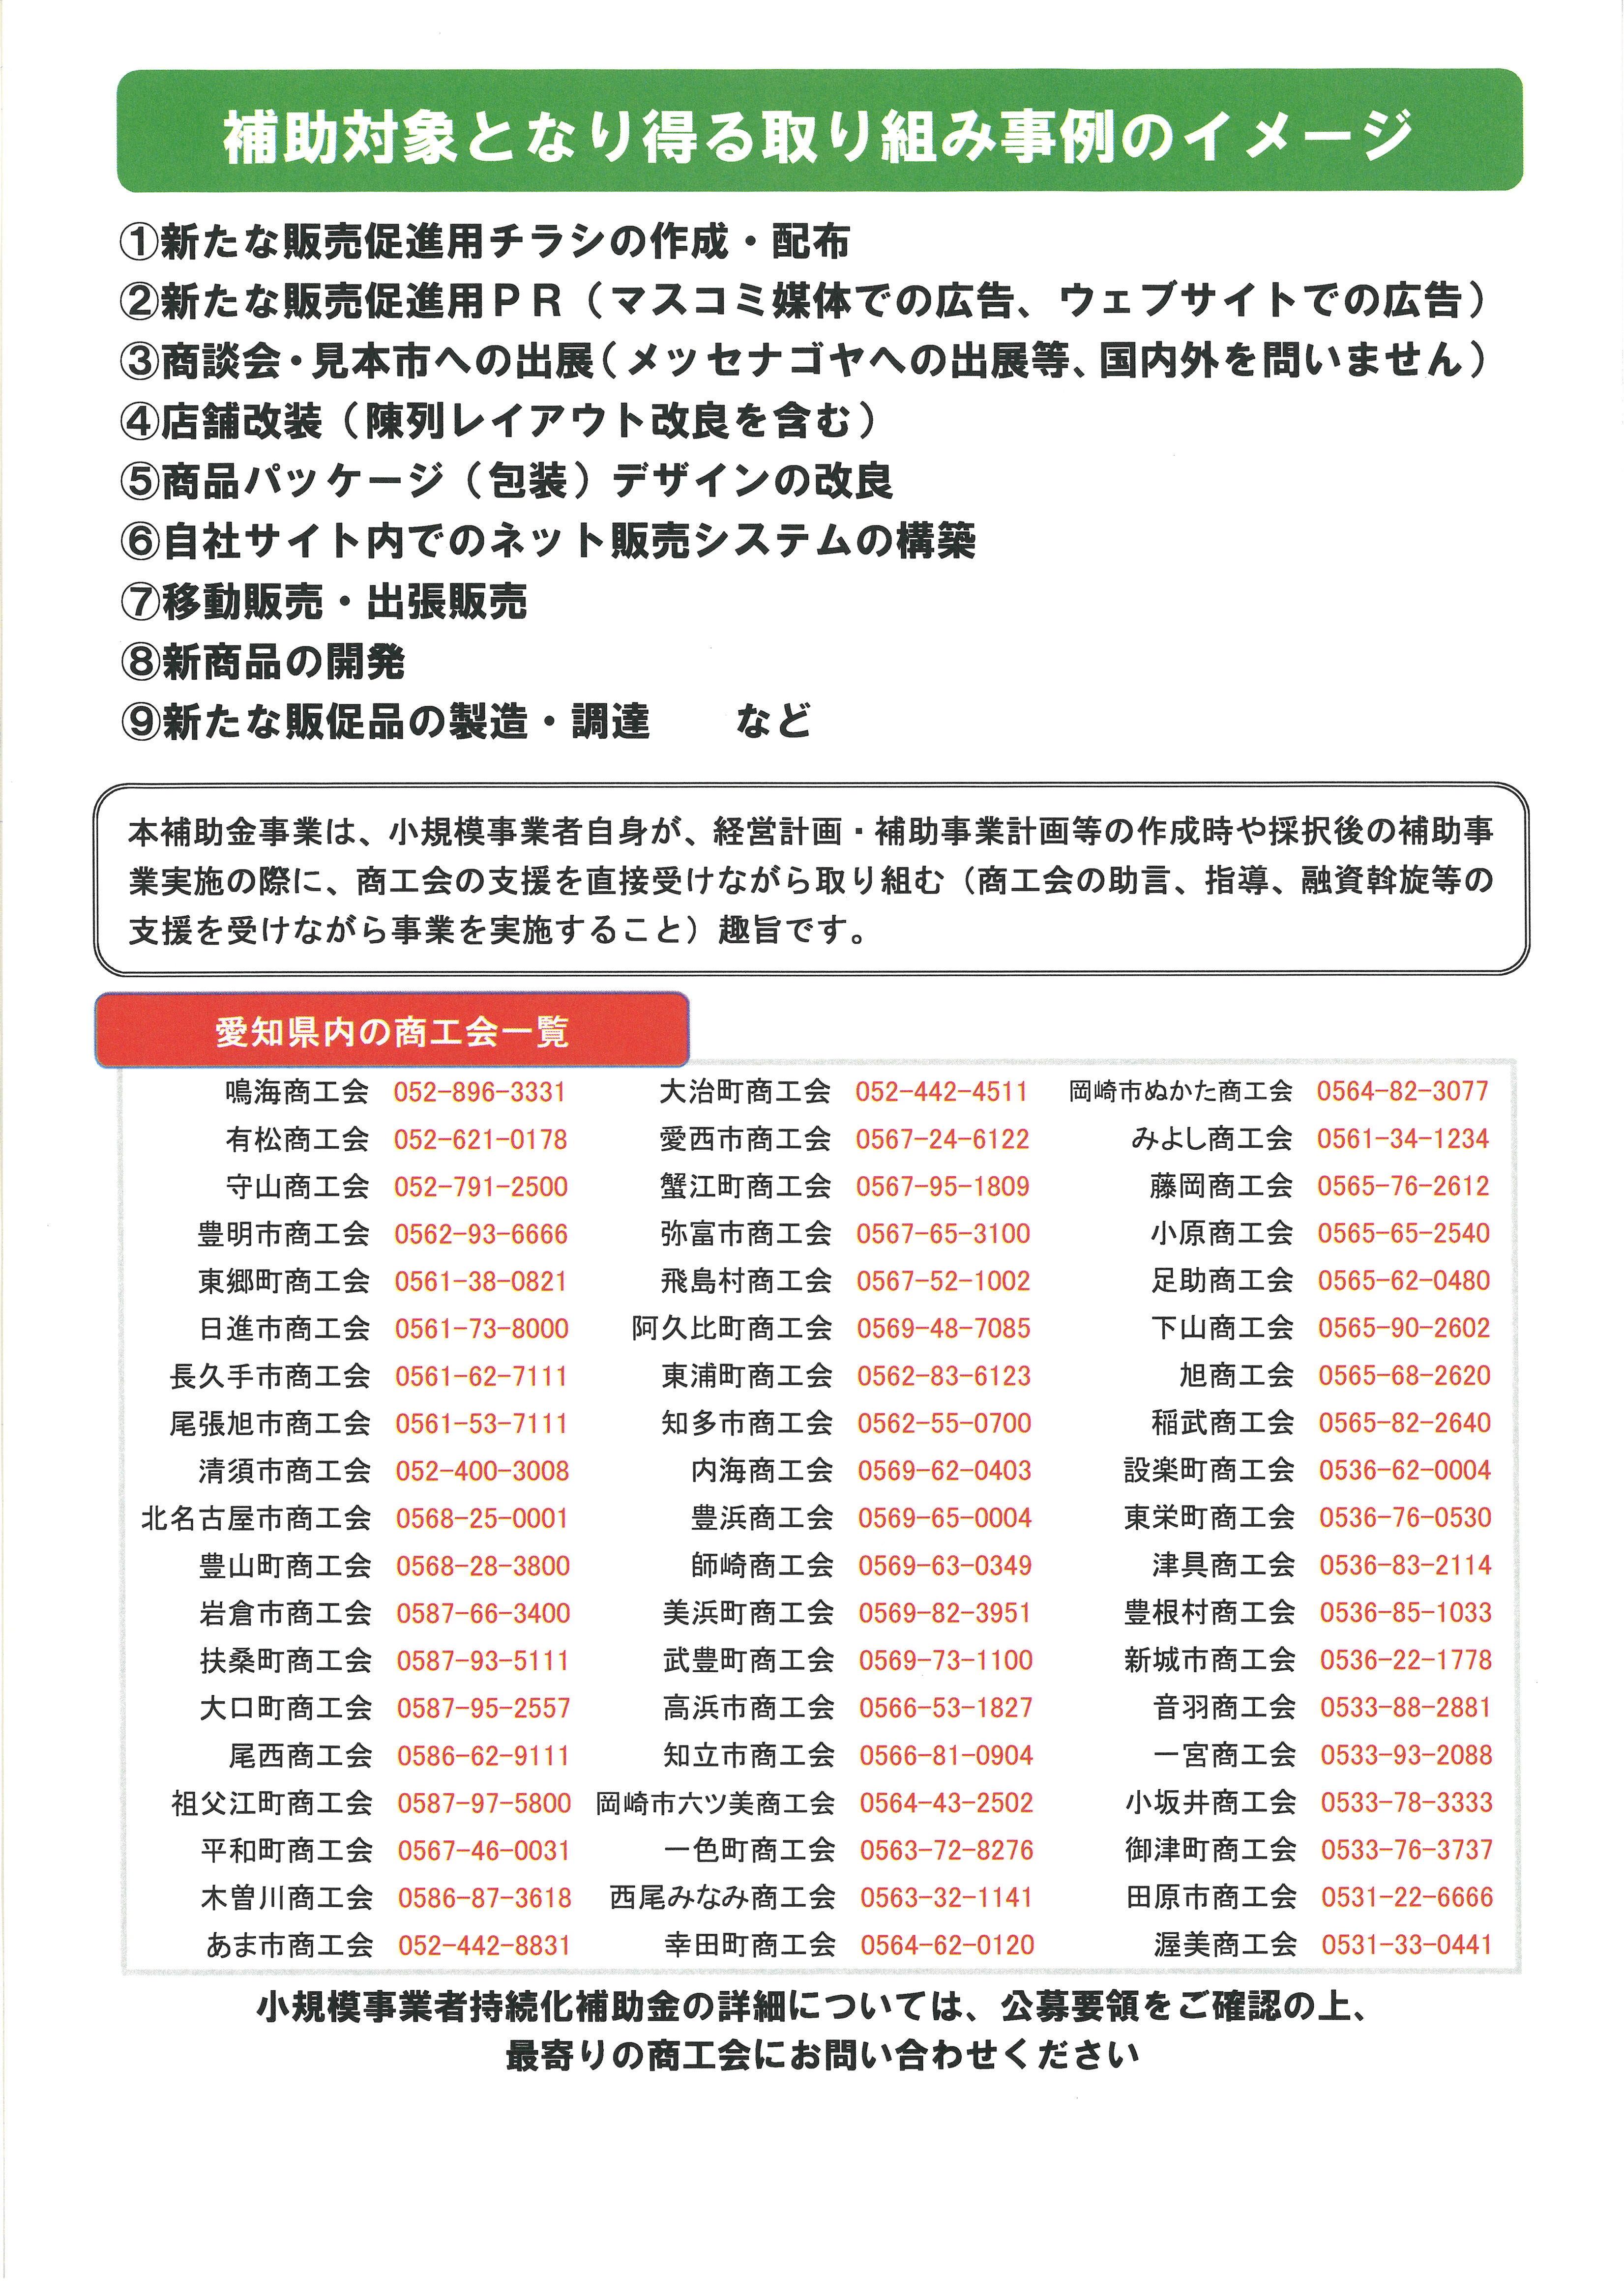 29補正・持続化補助金チラシ(2).jpg